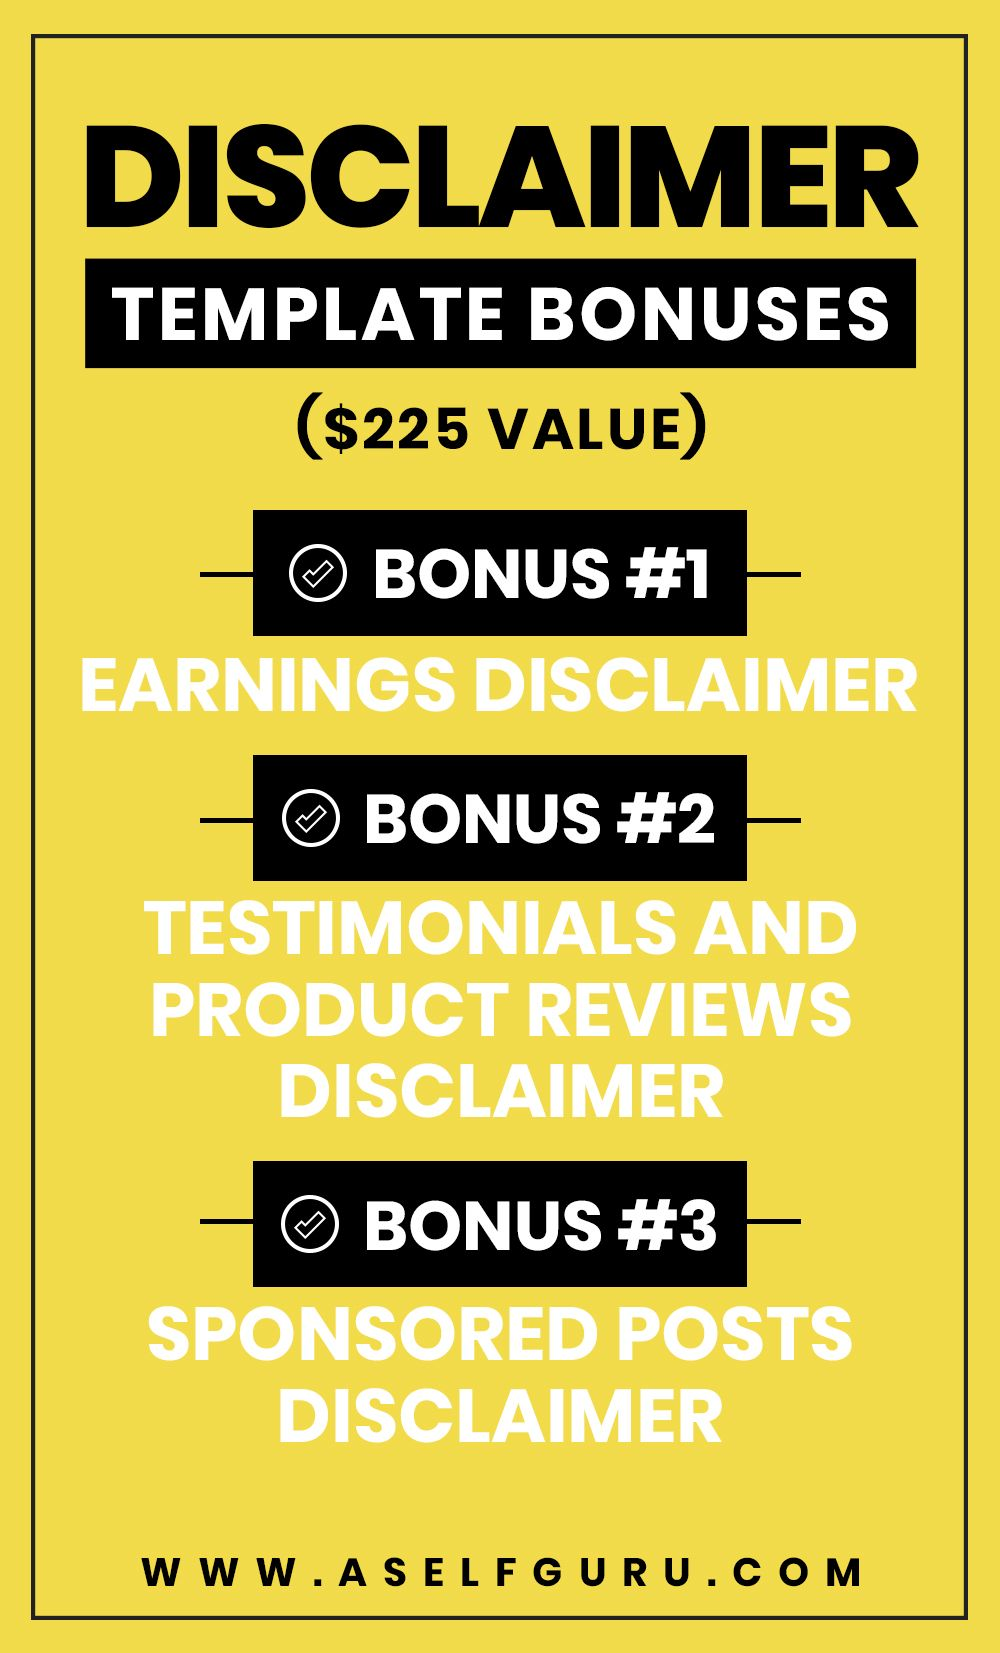 Earnings Disclaimer >> Disclaimer Template For Blog Includes 3 Bonuses Earnings Disclaimer